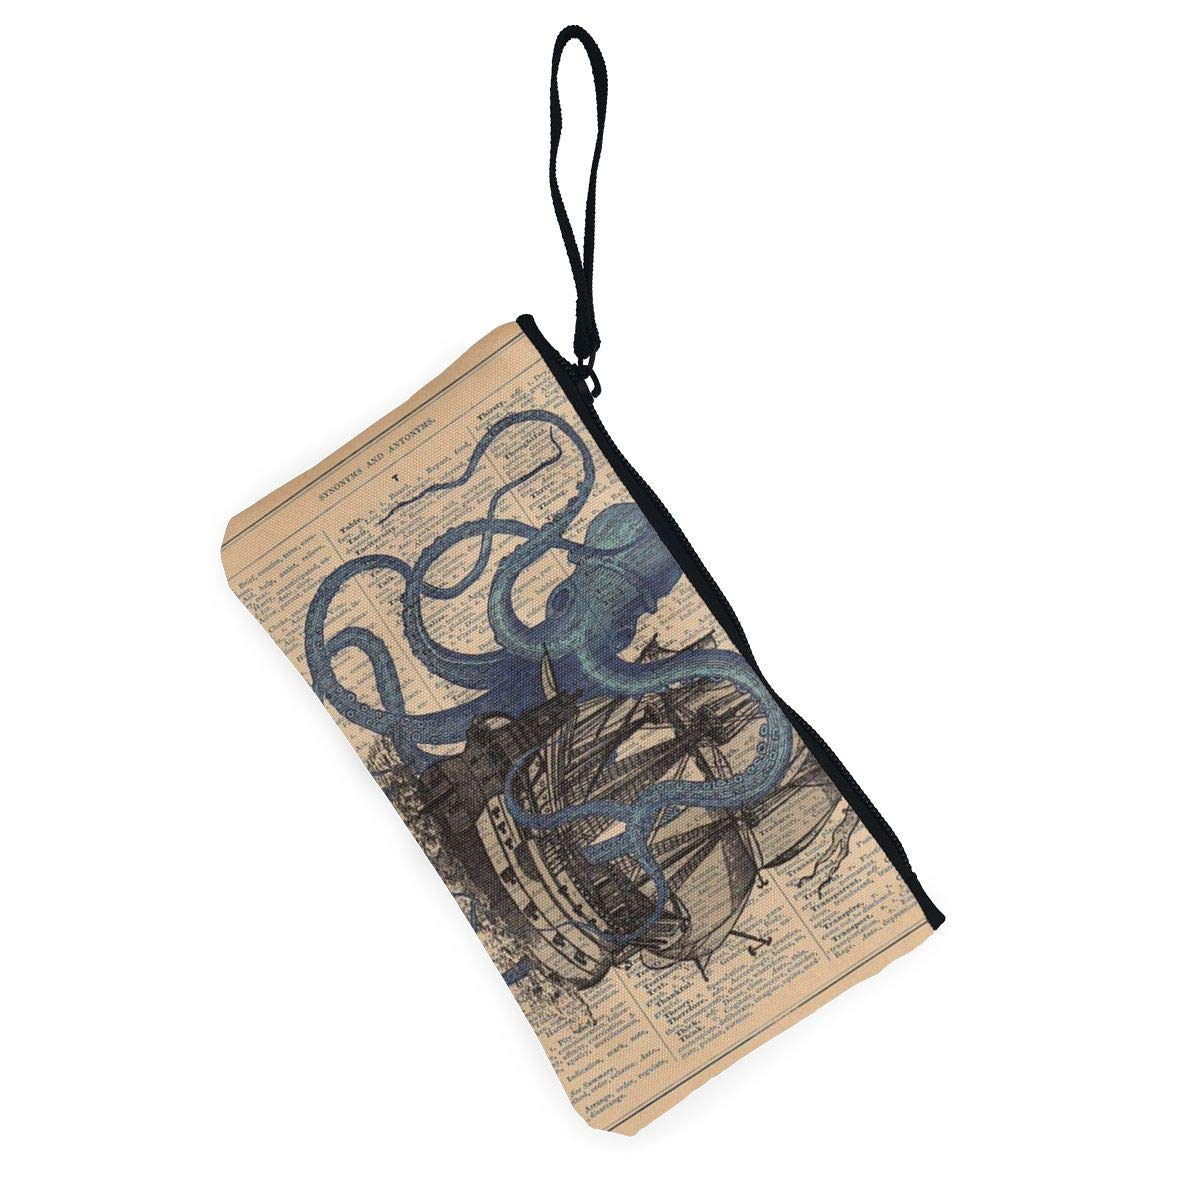 Womens Canvas Zip Around Wallet Ladies Clutch Travel Purse Wrist Strap Ocean Octopus Nautical Boat Pirate Flag